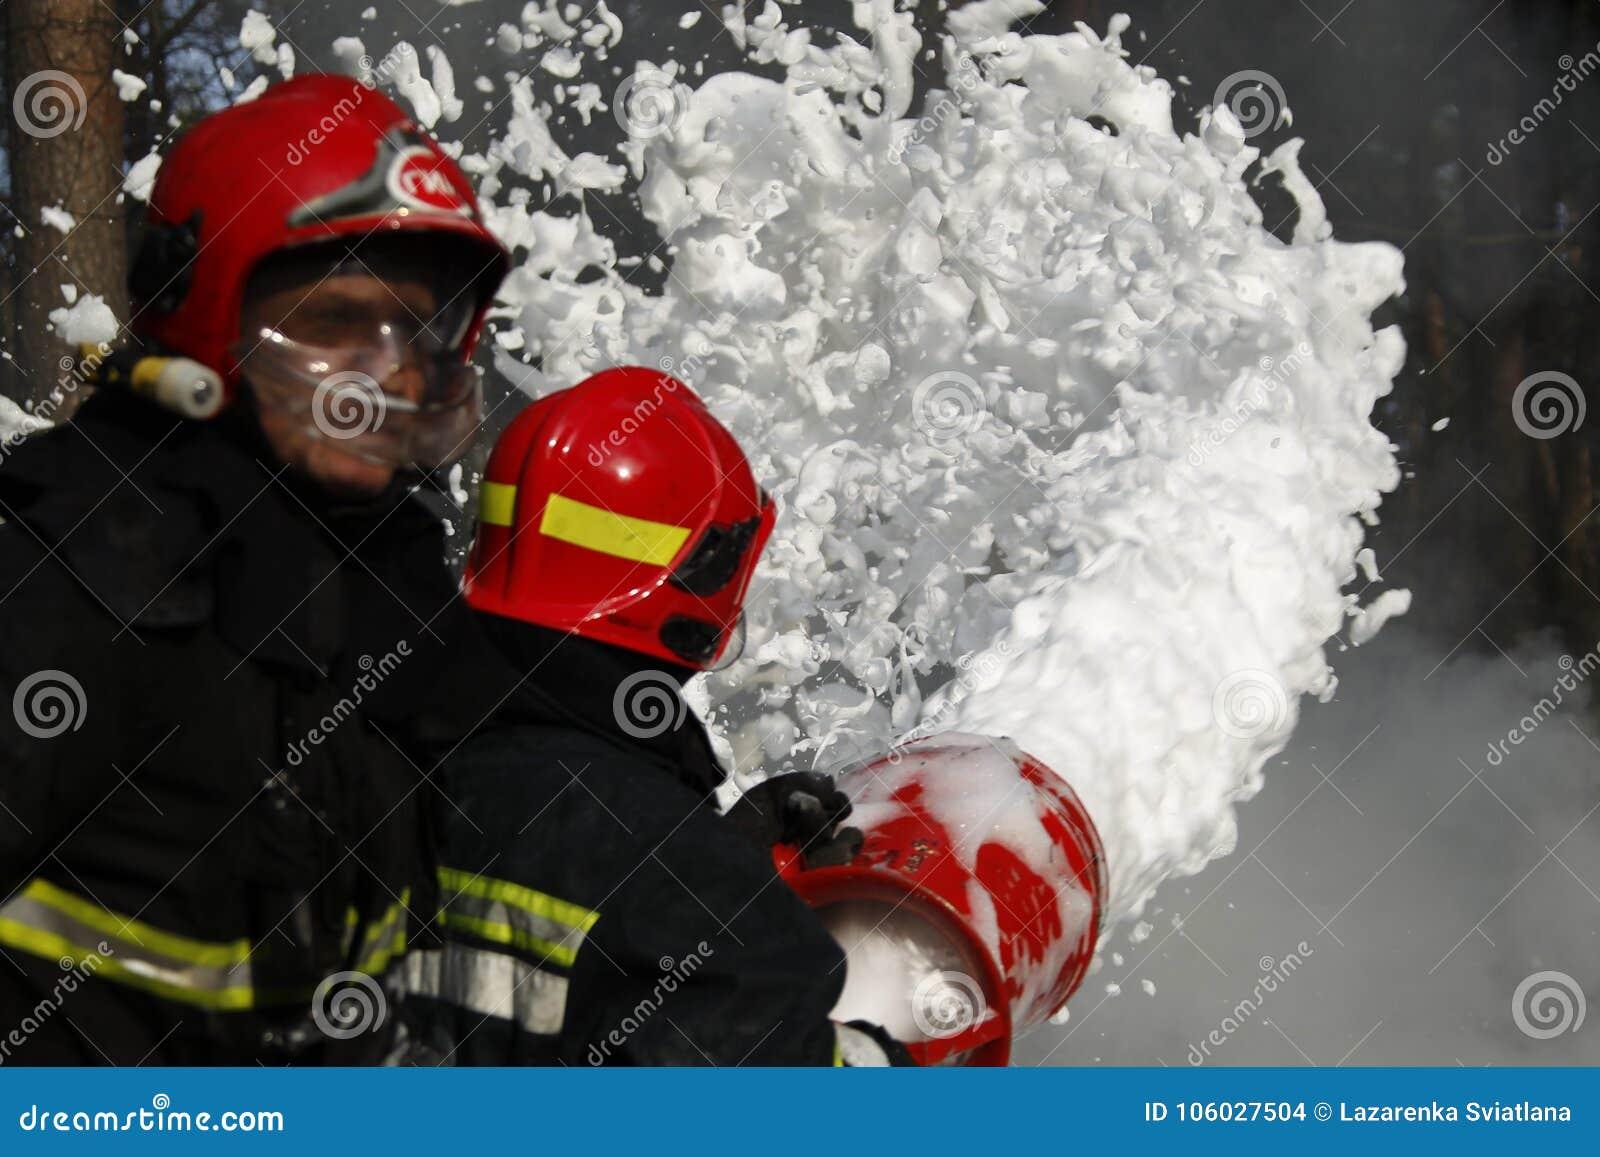 Extinguish forest fire